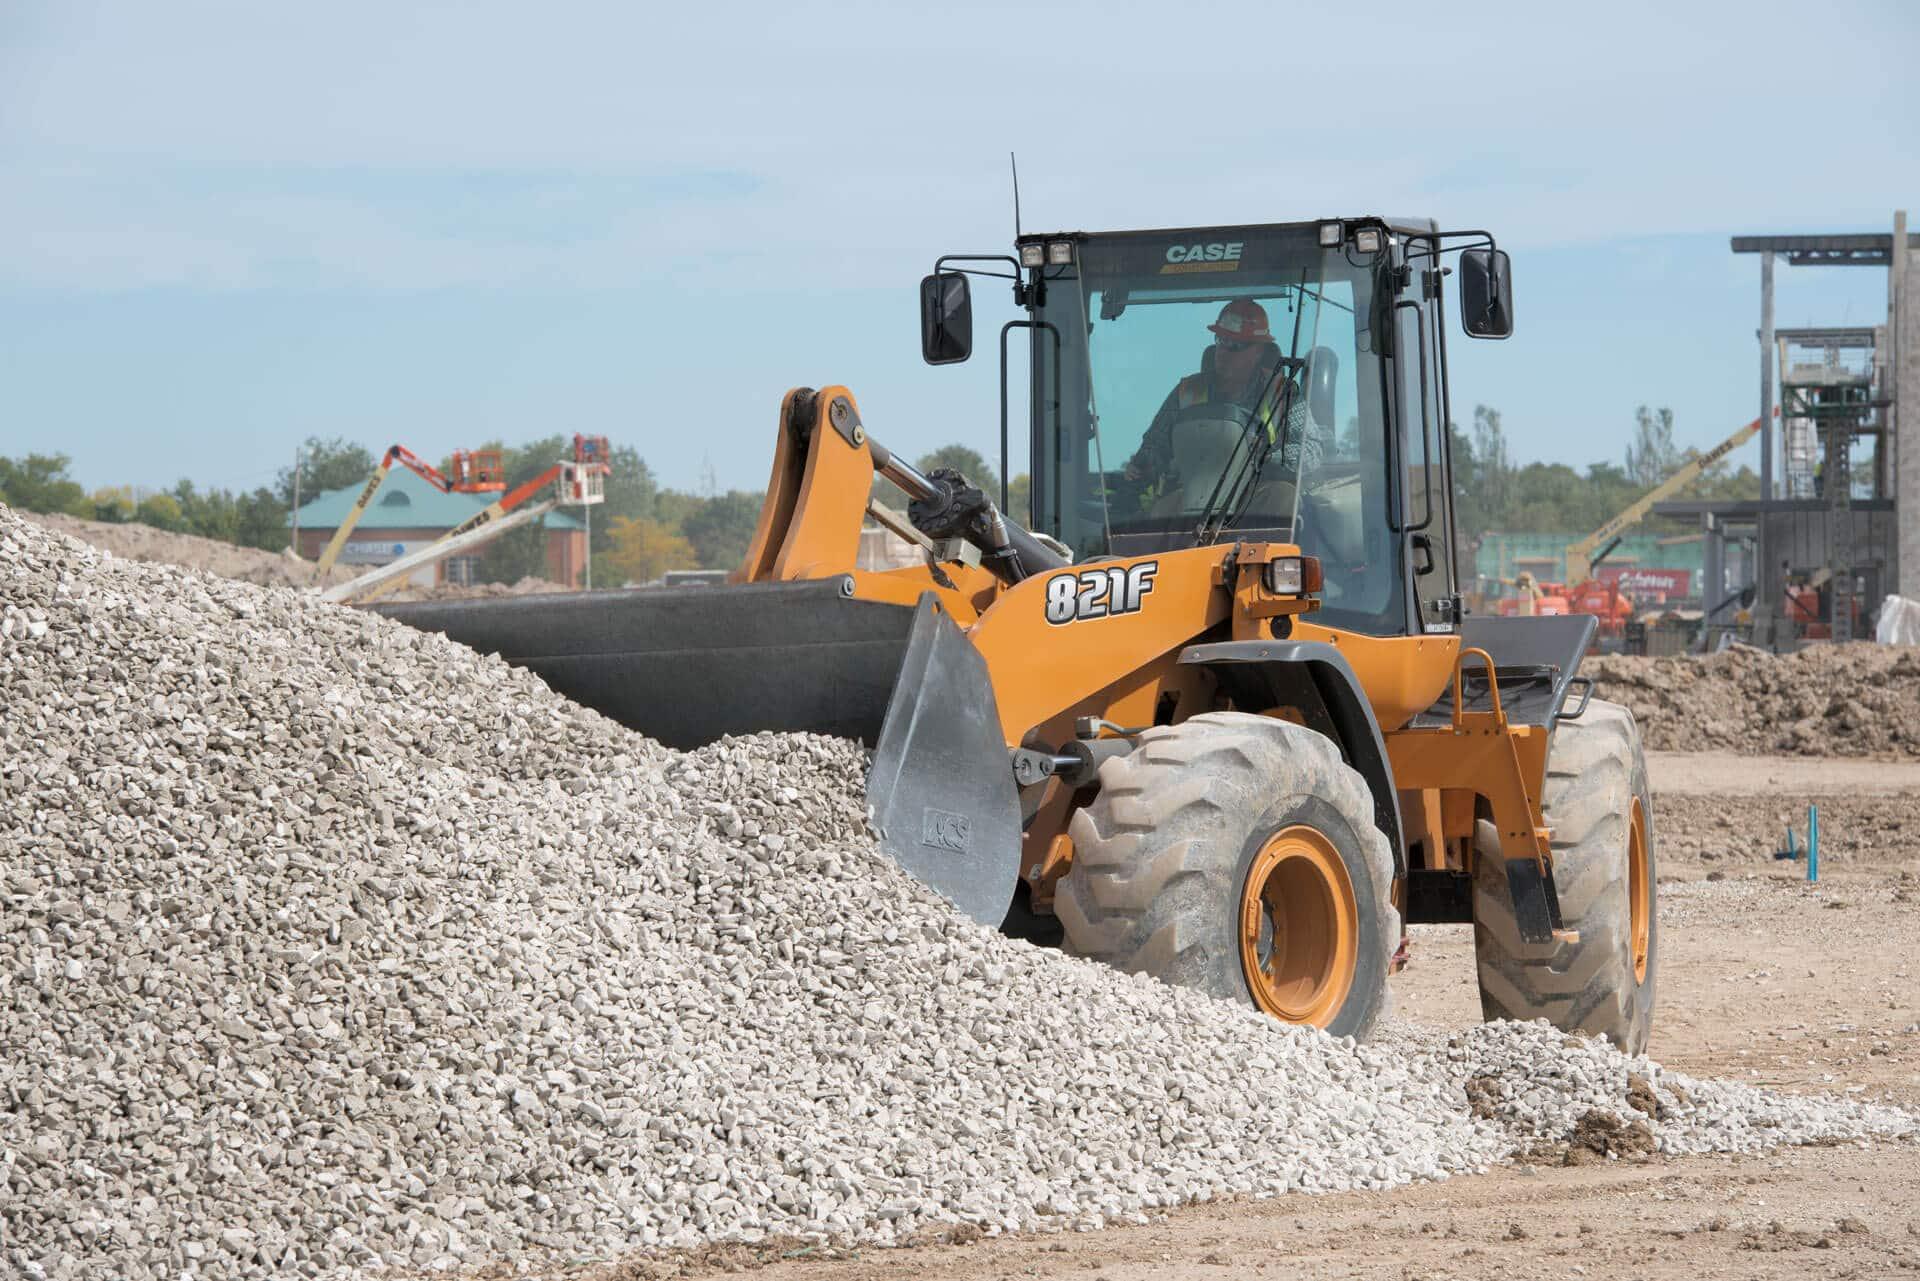 821F_RJP0355_T4F?Width=1024&Height=576 case 821f wheel loader case construction equipment  at alyssarenee.co